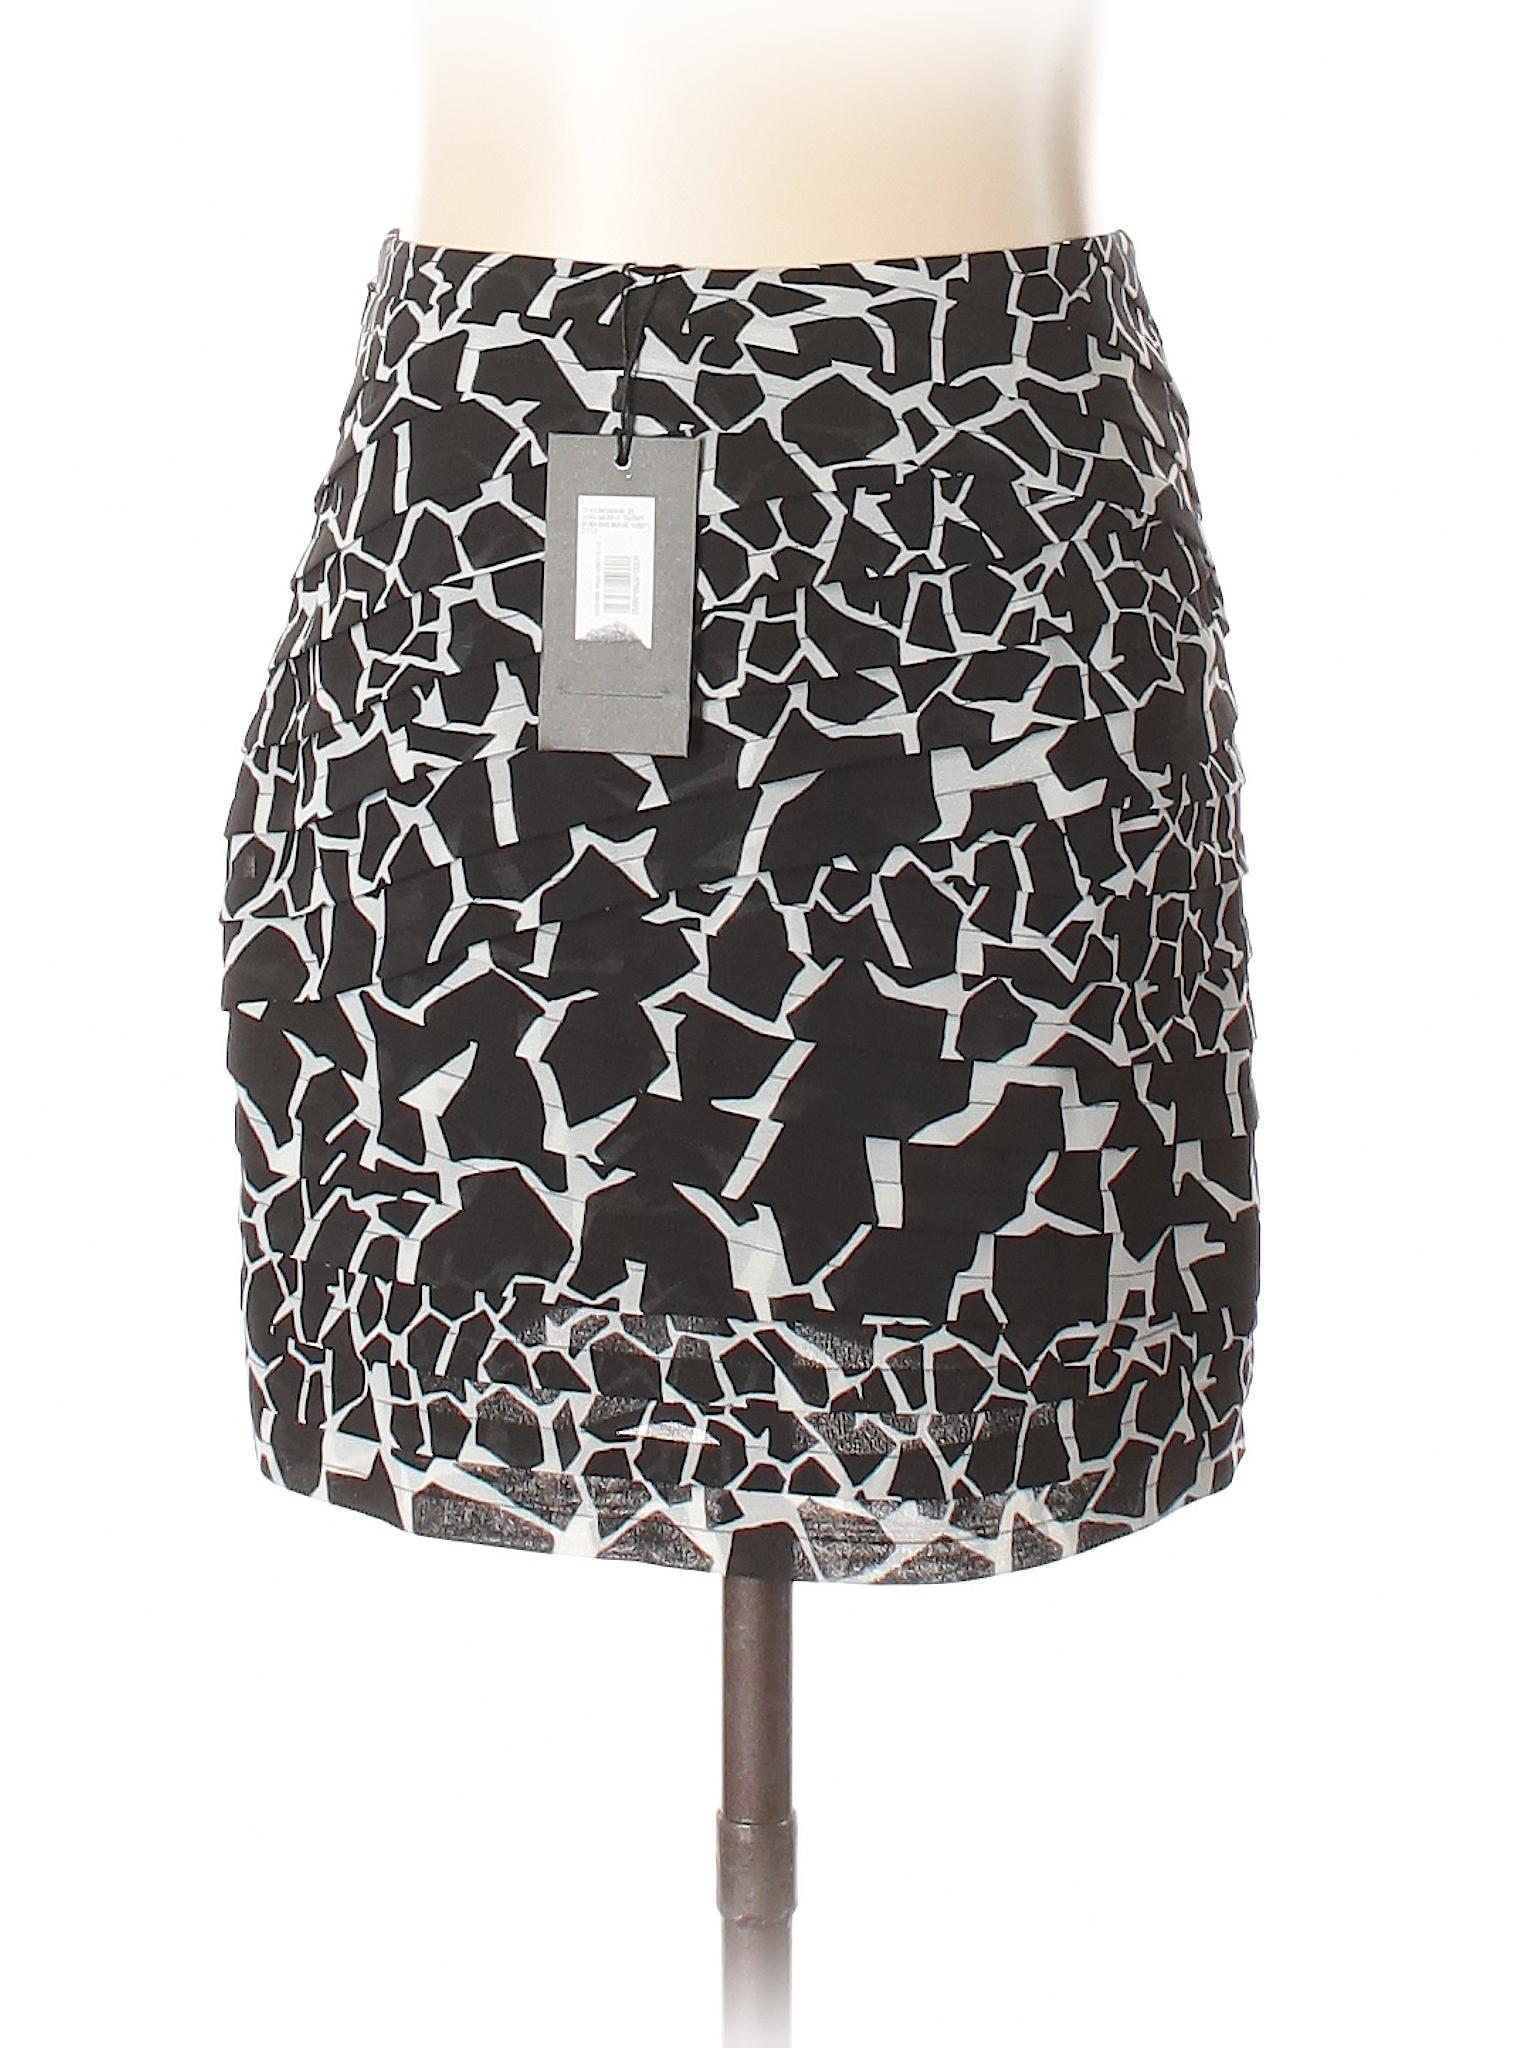 Skirt Exchange Casual Armani Skirt Boutique Casual Armani Armani Boutique Exchange Boutique Exchange wqZ1UIw